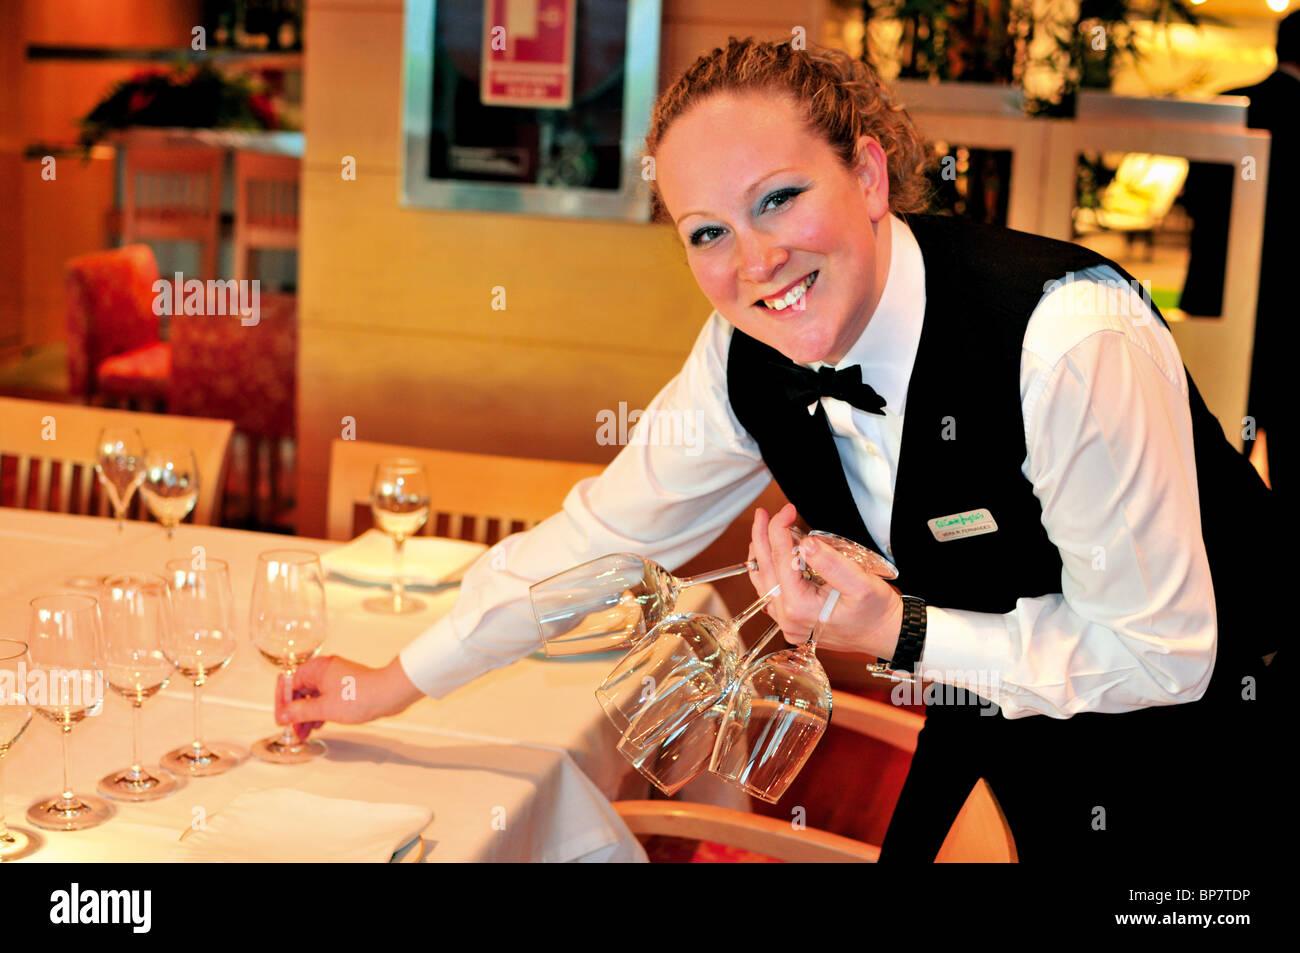 "Portugal, Lissabon: Kellnerin Vera Fernandes Vorbereitung Tisch im Restaurant ""El Corte Inglés"" Stockbild"